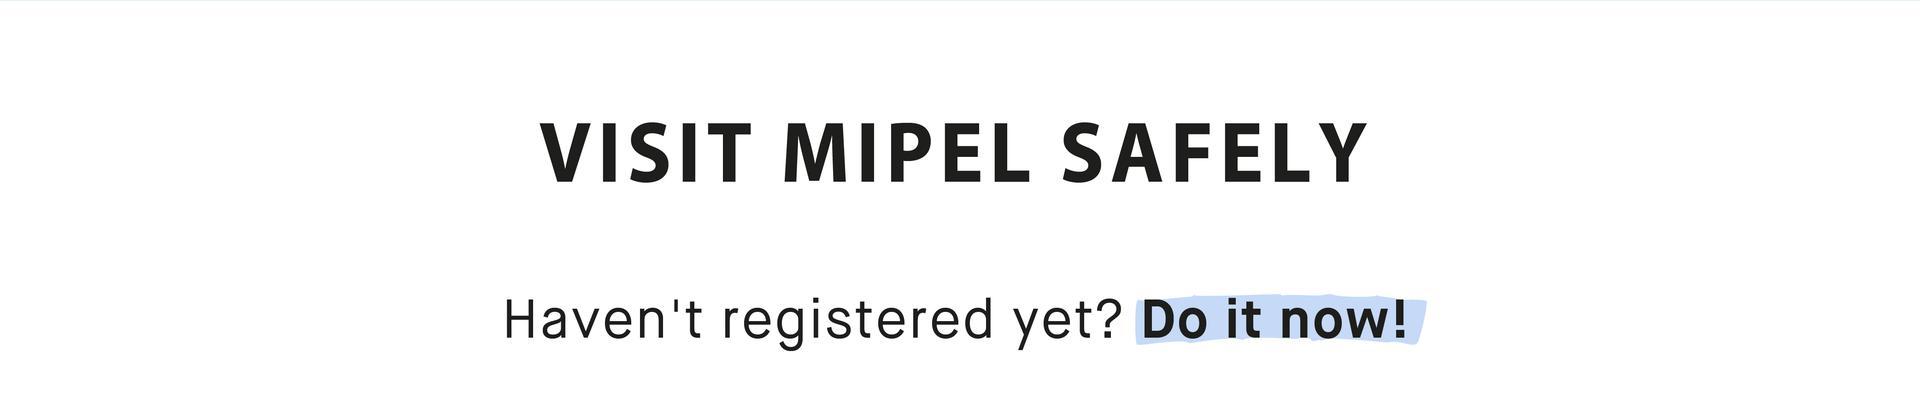 VISIT MIPEL120 SAFELY: Haven't registered yet? Do it now!